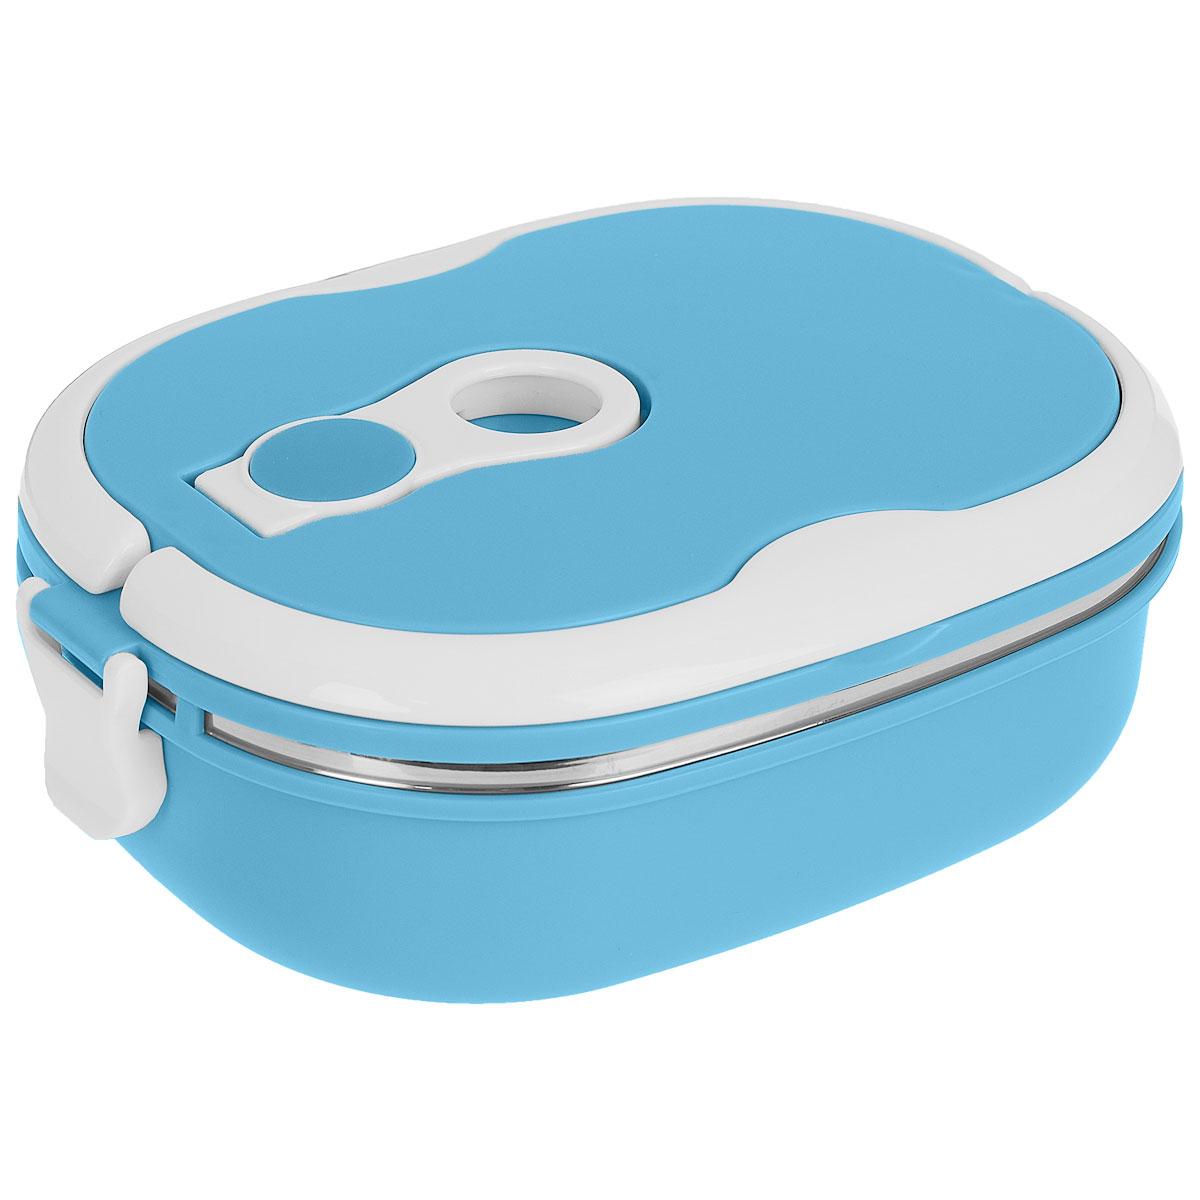 Термо ланч-бокс Bradex Bento, цвет: синий, 0,9 л